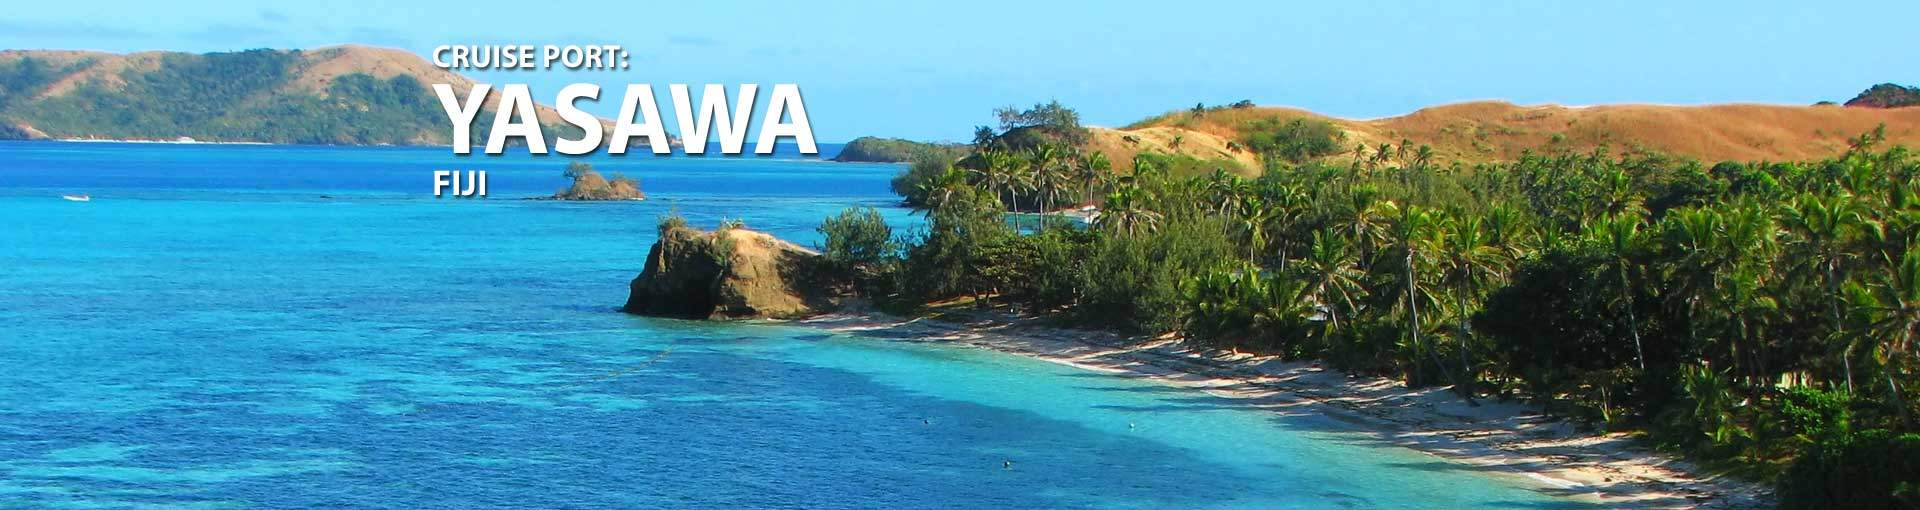 Cruises to Yasawa, Fiji